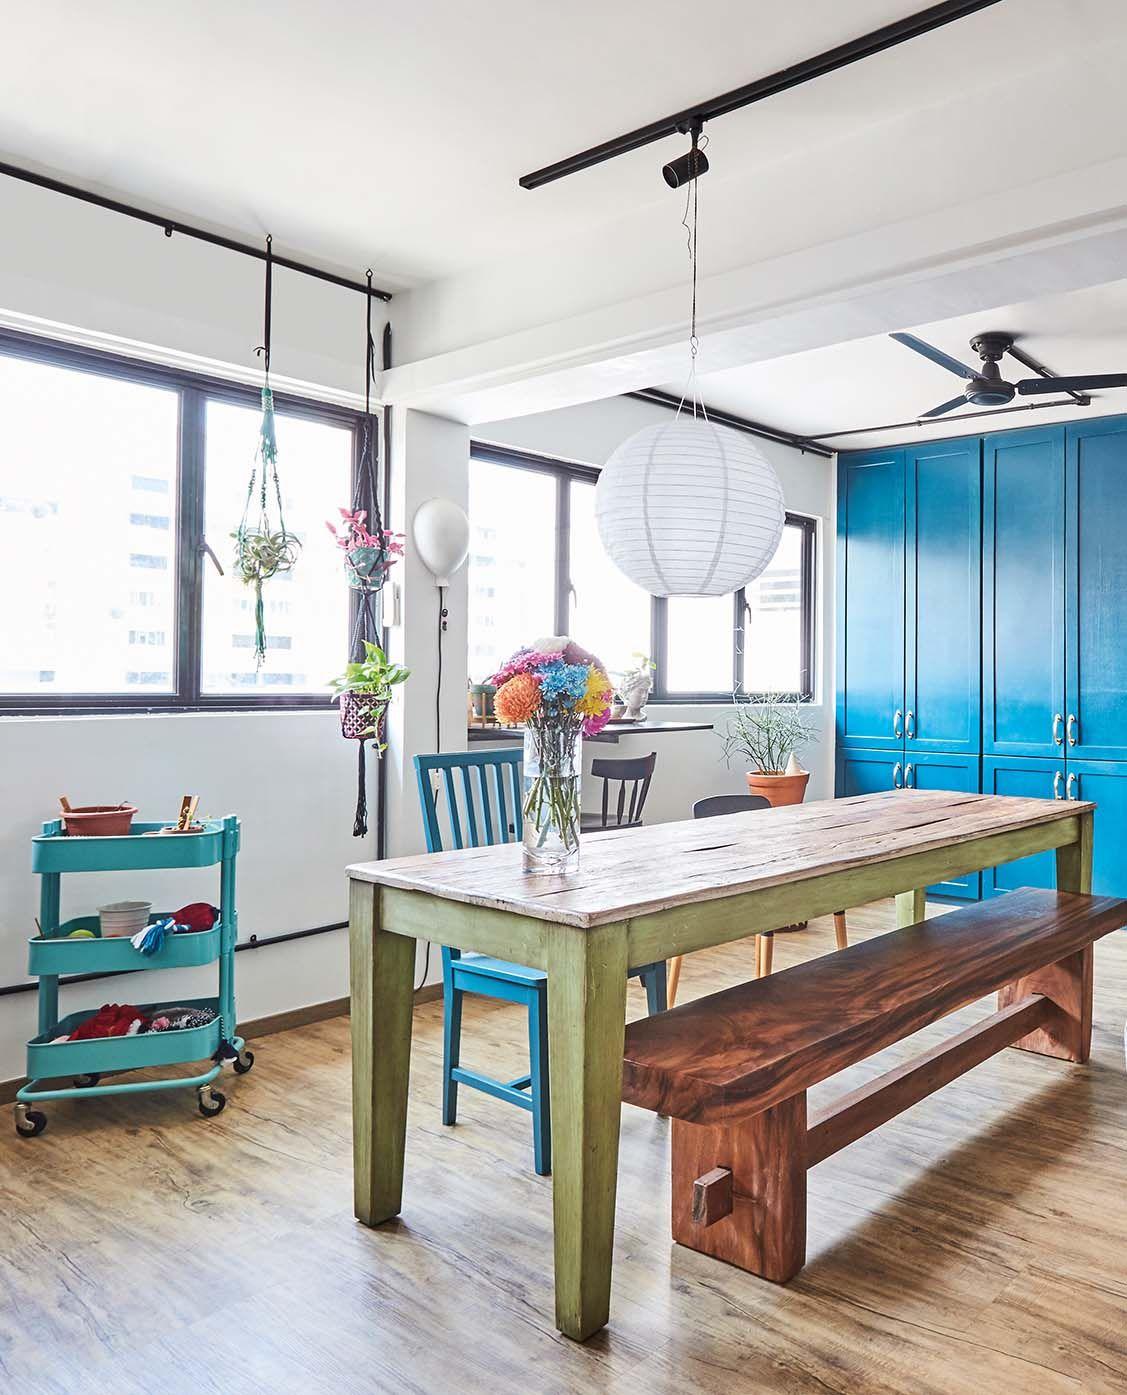 Home Design Ideas For Hdb Flats: Four-room HDB Resale Apartment. Design : Woodworks